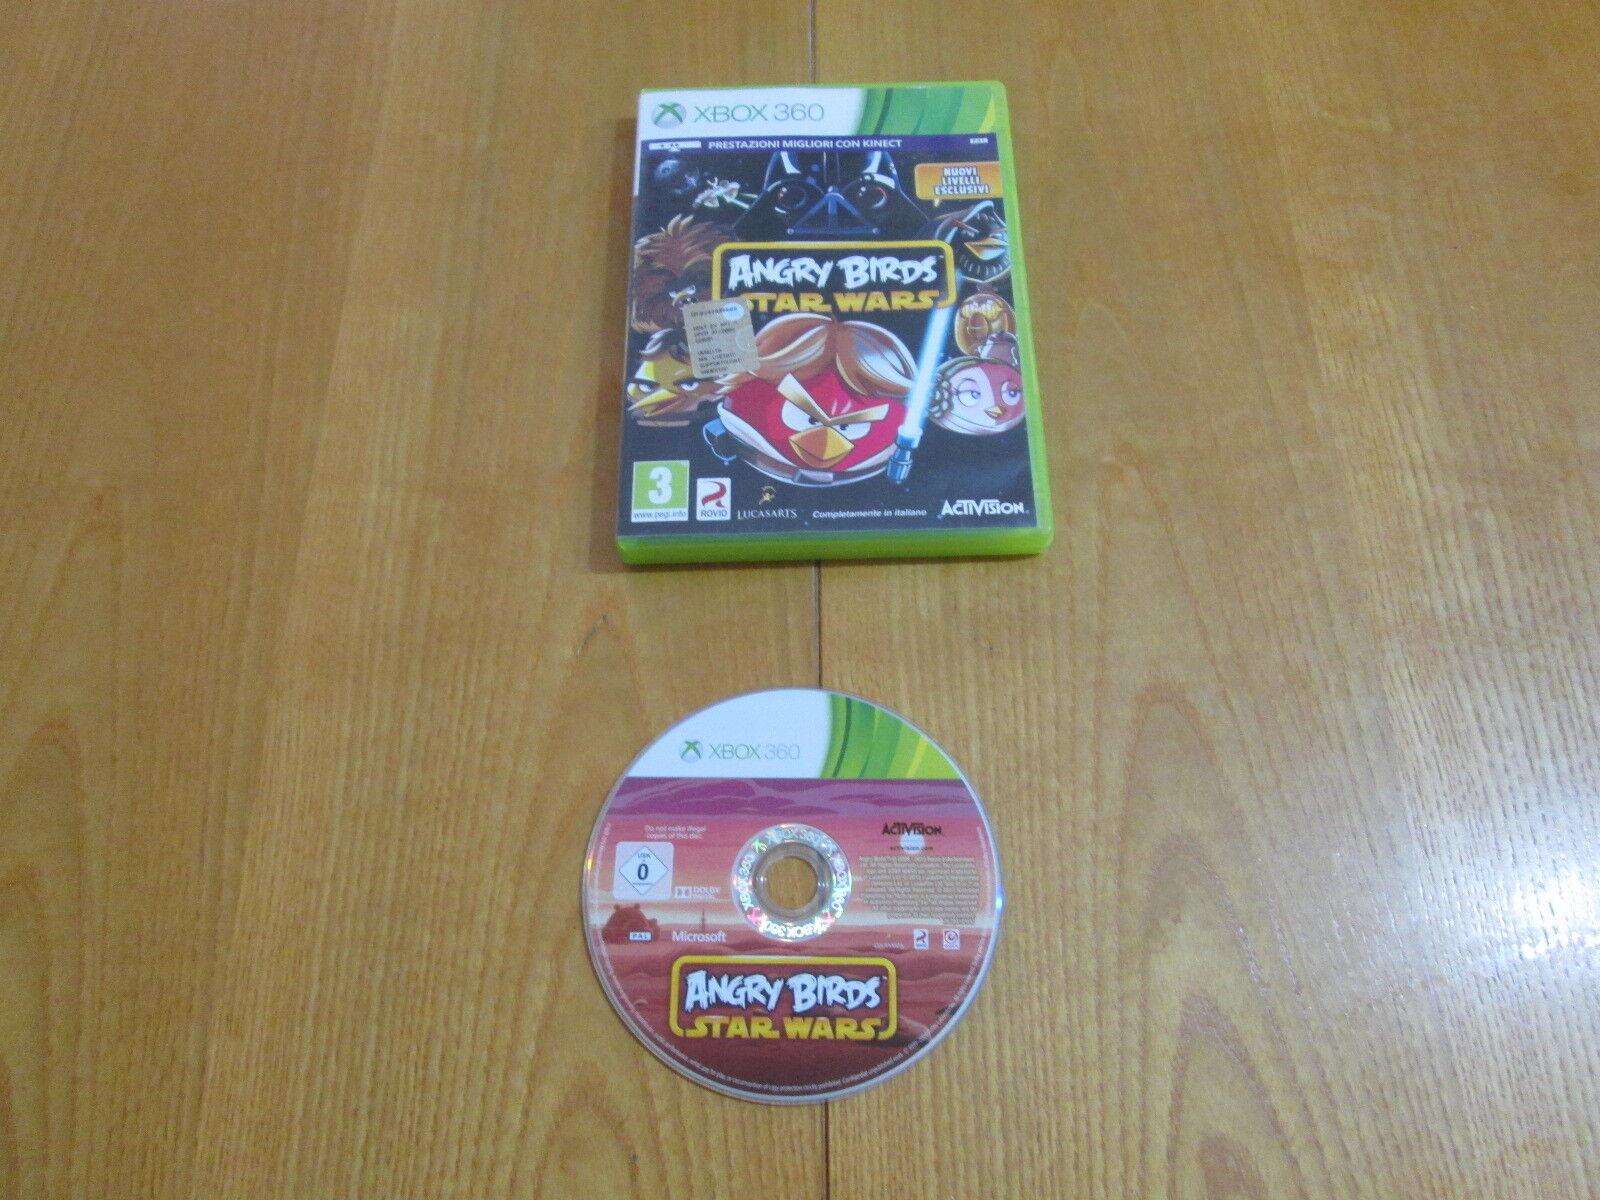 XBOX 360 - ANGRY BIRDS STAR WARS - Completo e - jeu StarWars